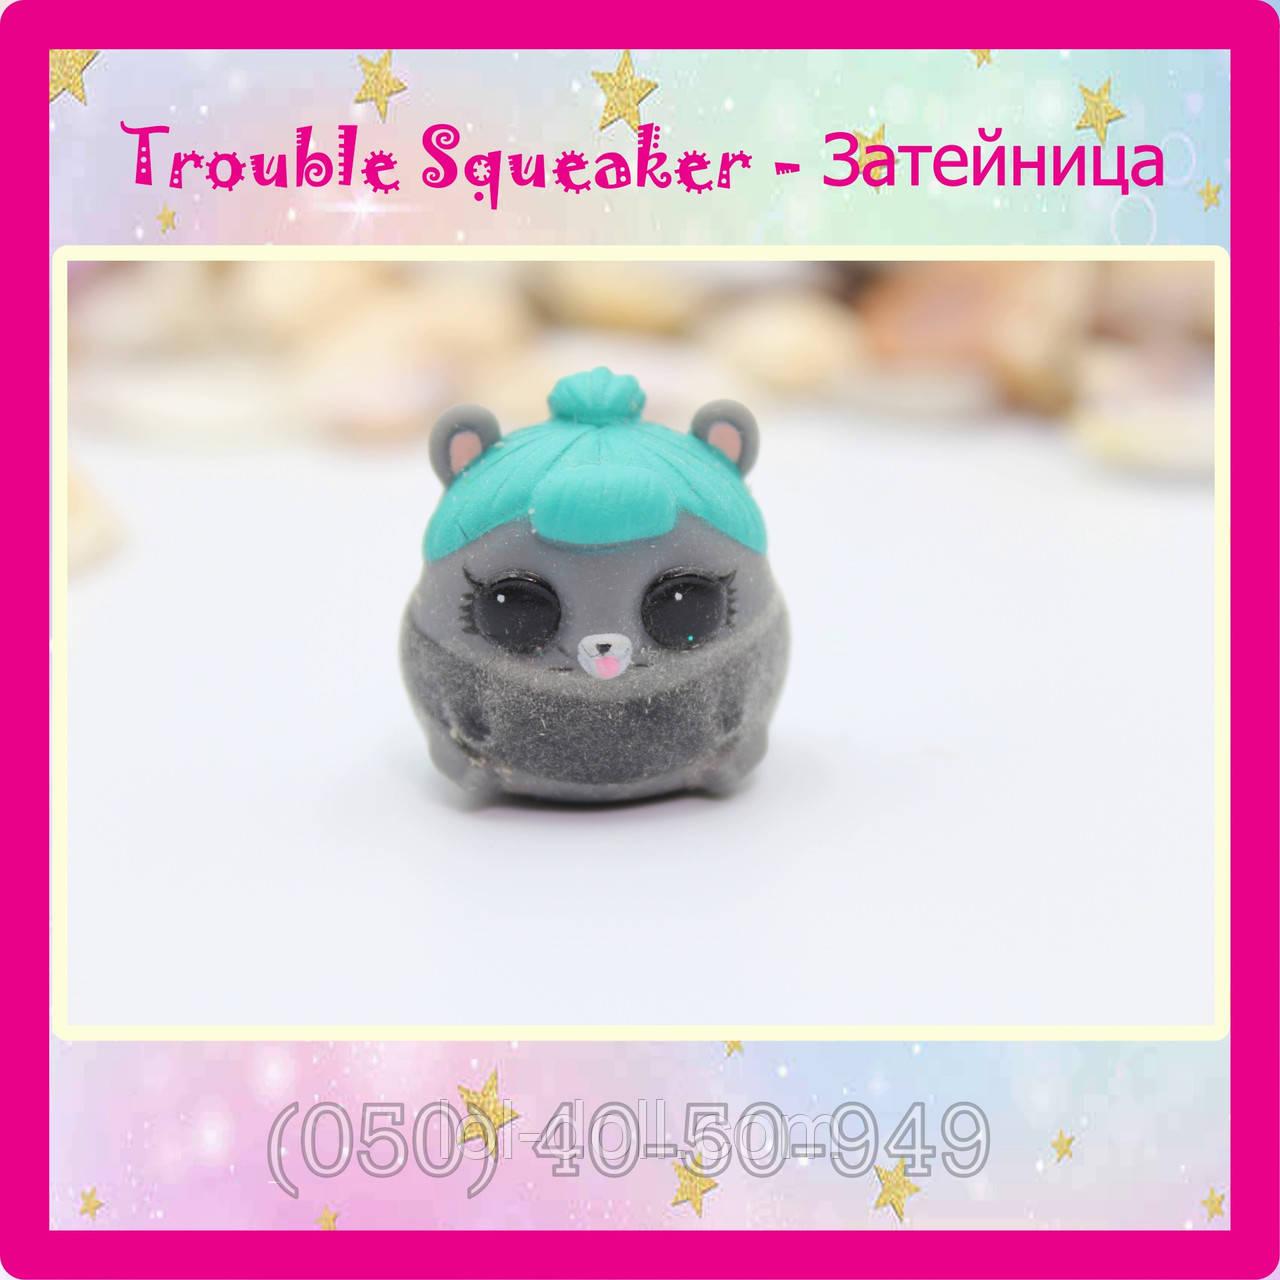 Кукла LOL Surprise Питомец Trouble Squeaker - Затейница Лол Сюрприз Без Шара Оригинал